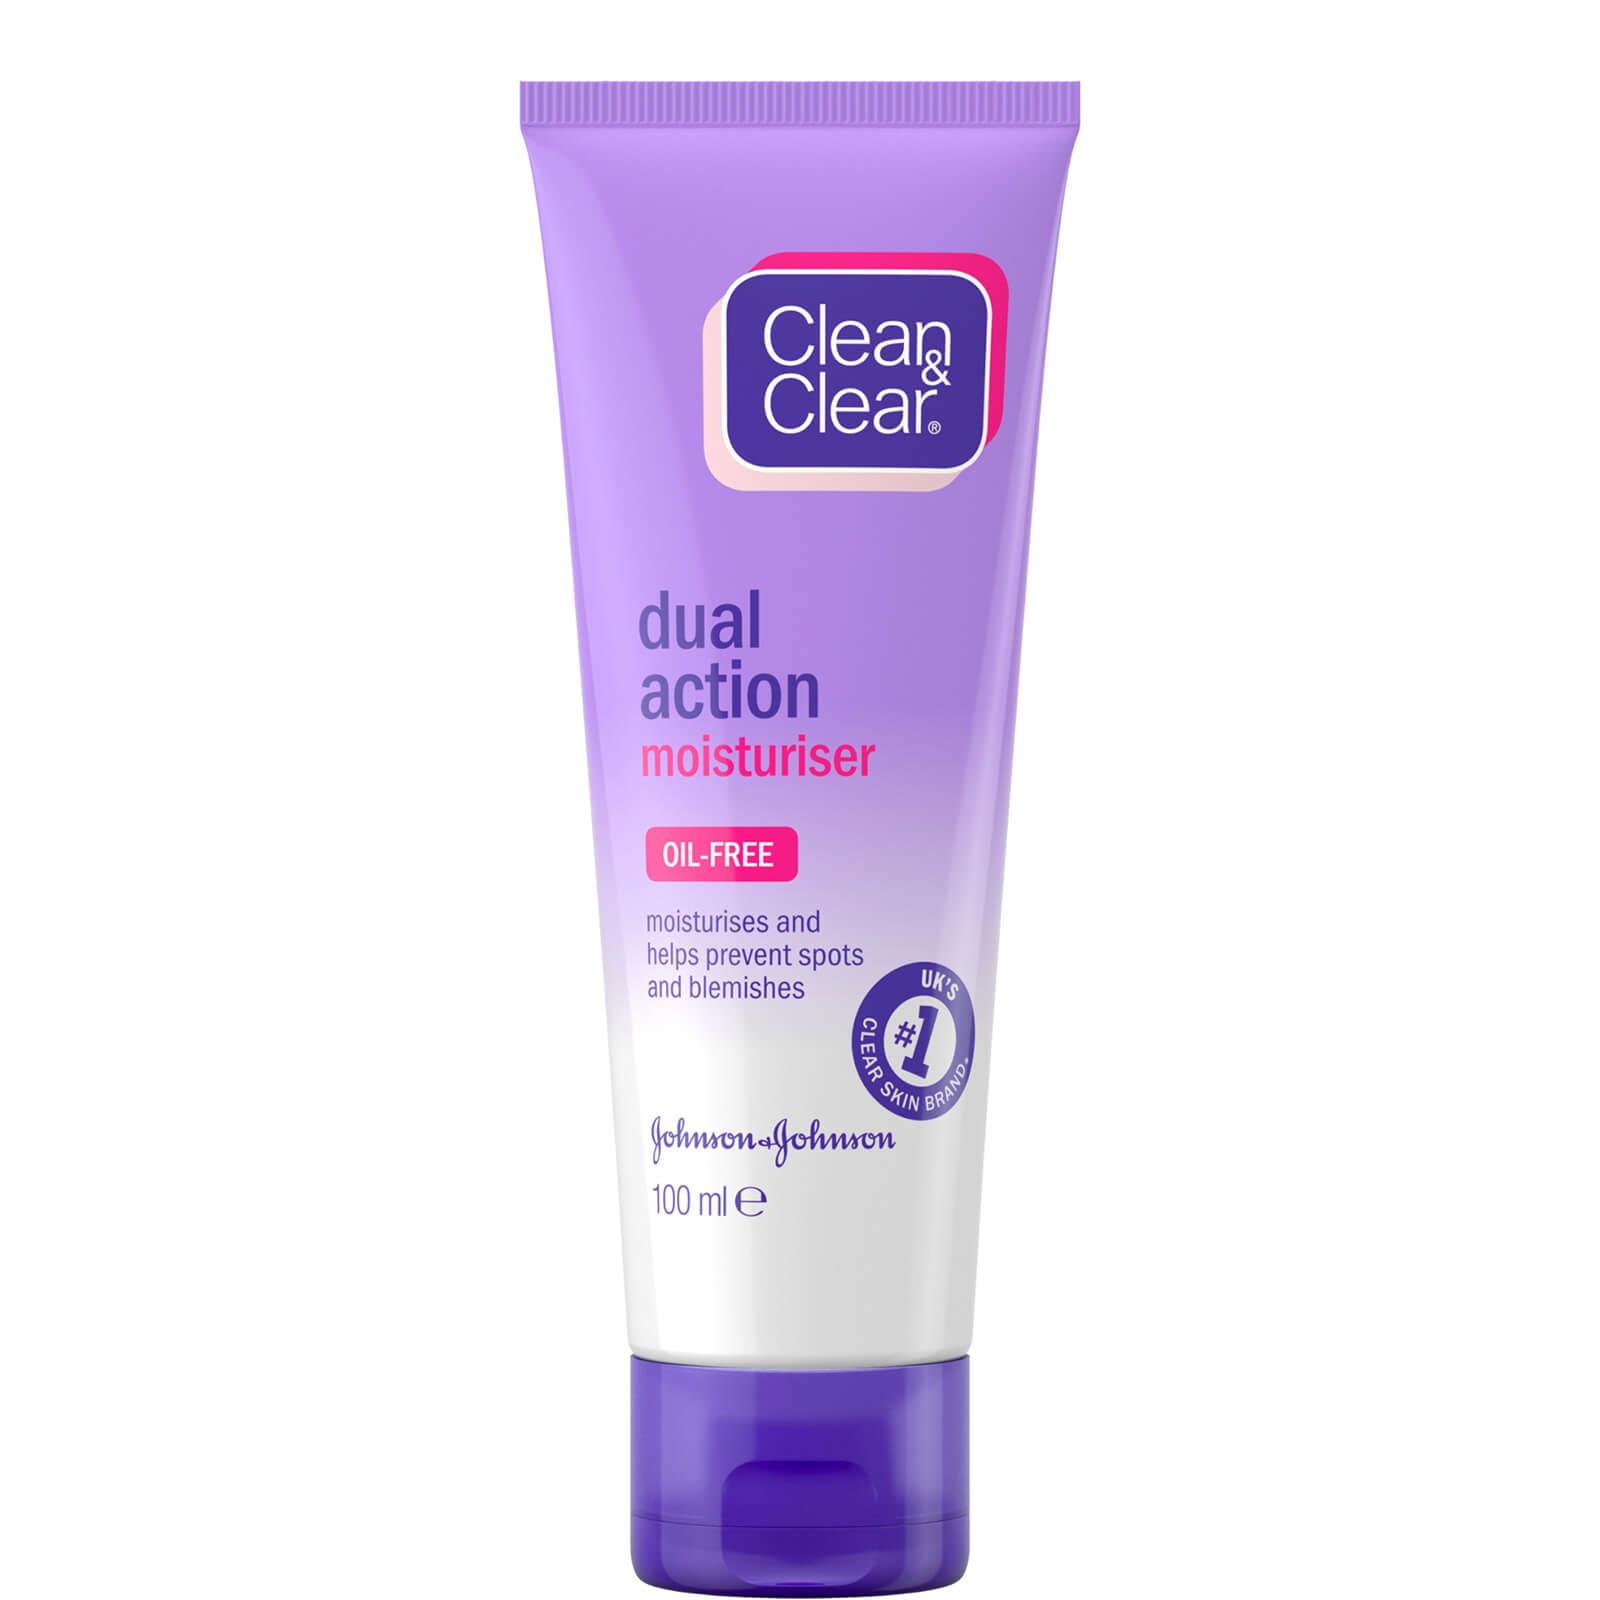 Купить Clean & Clear Dual Action Moisturiser 100ml